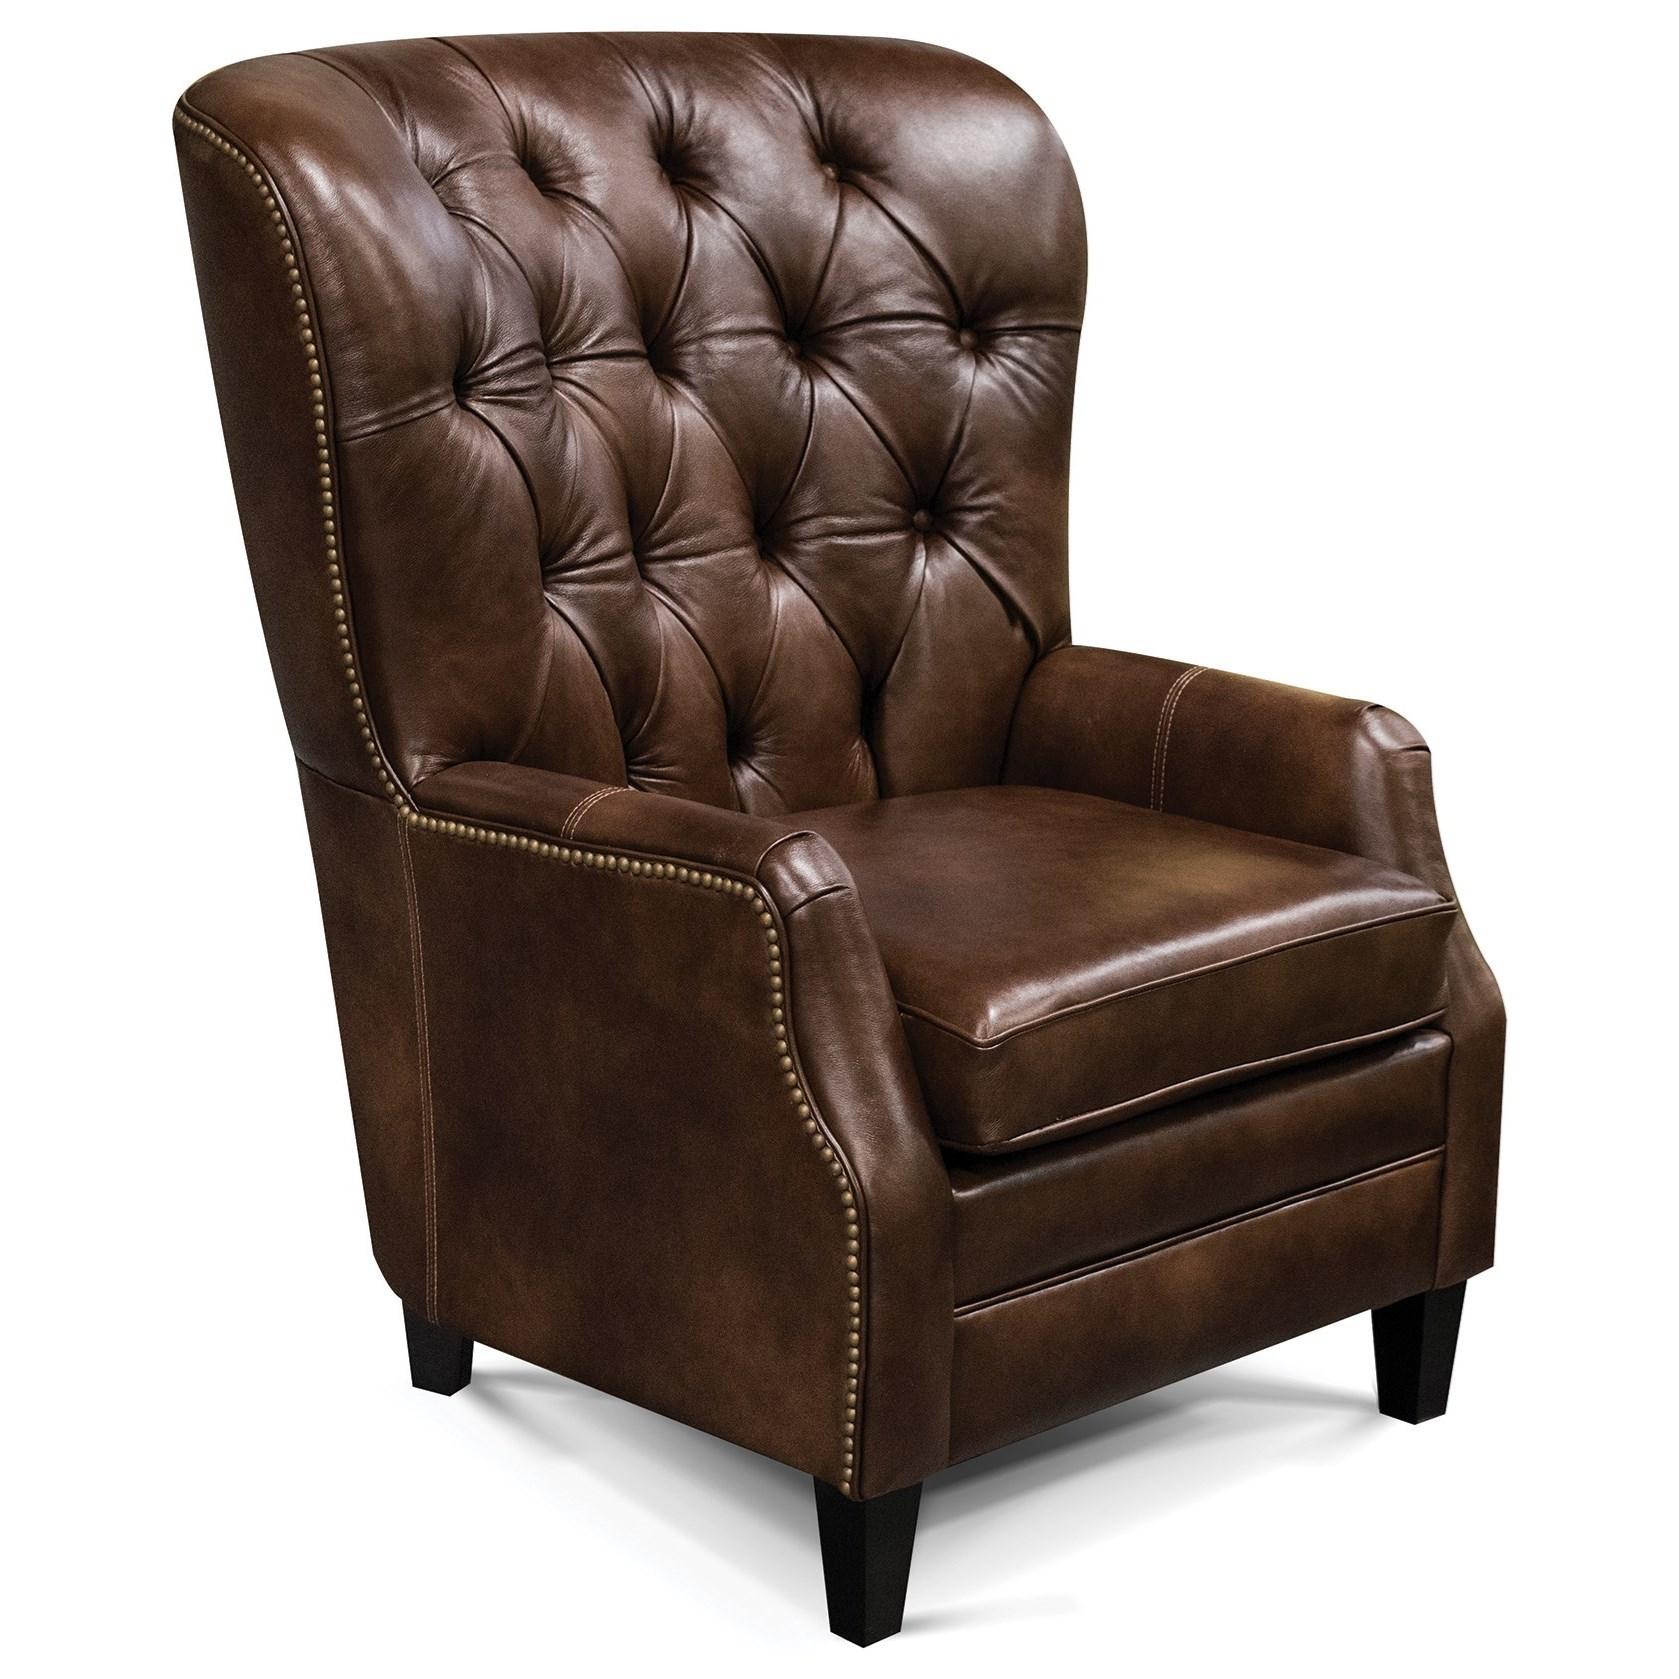 England Ryker Tufted-Back Den Room Chair - Item Number: 7C04ALN-Heirloom-Chimera